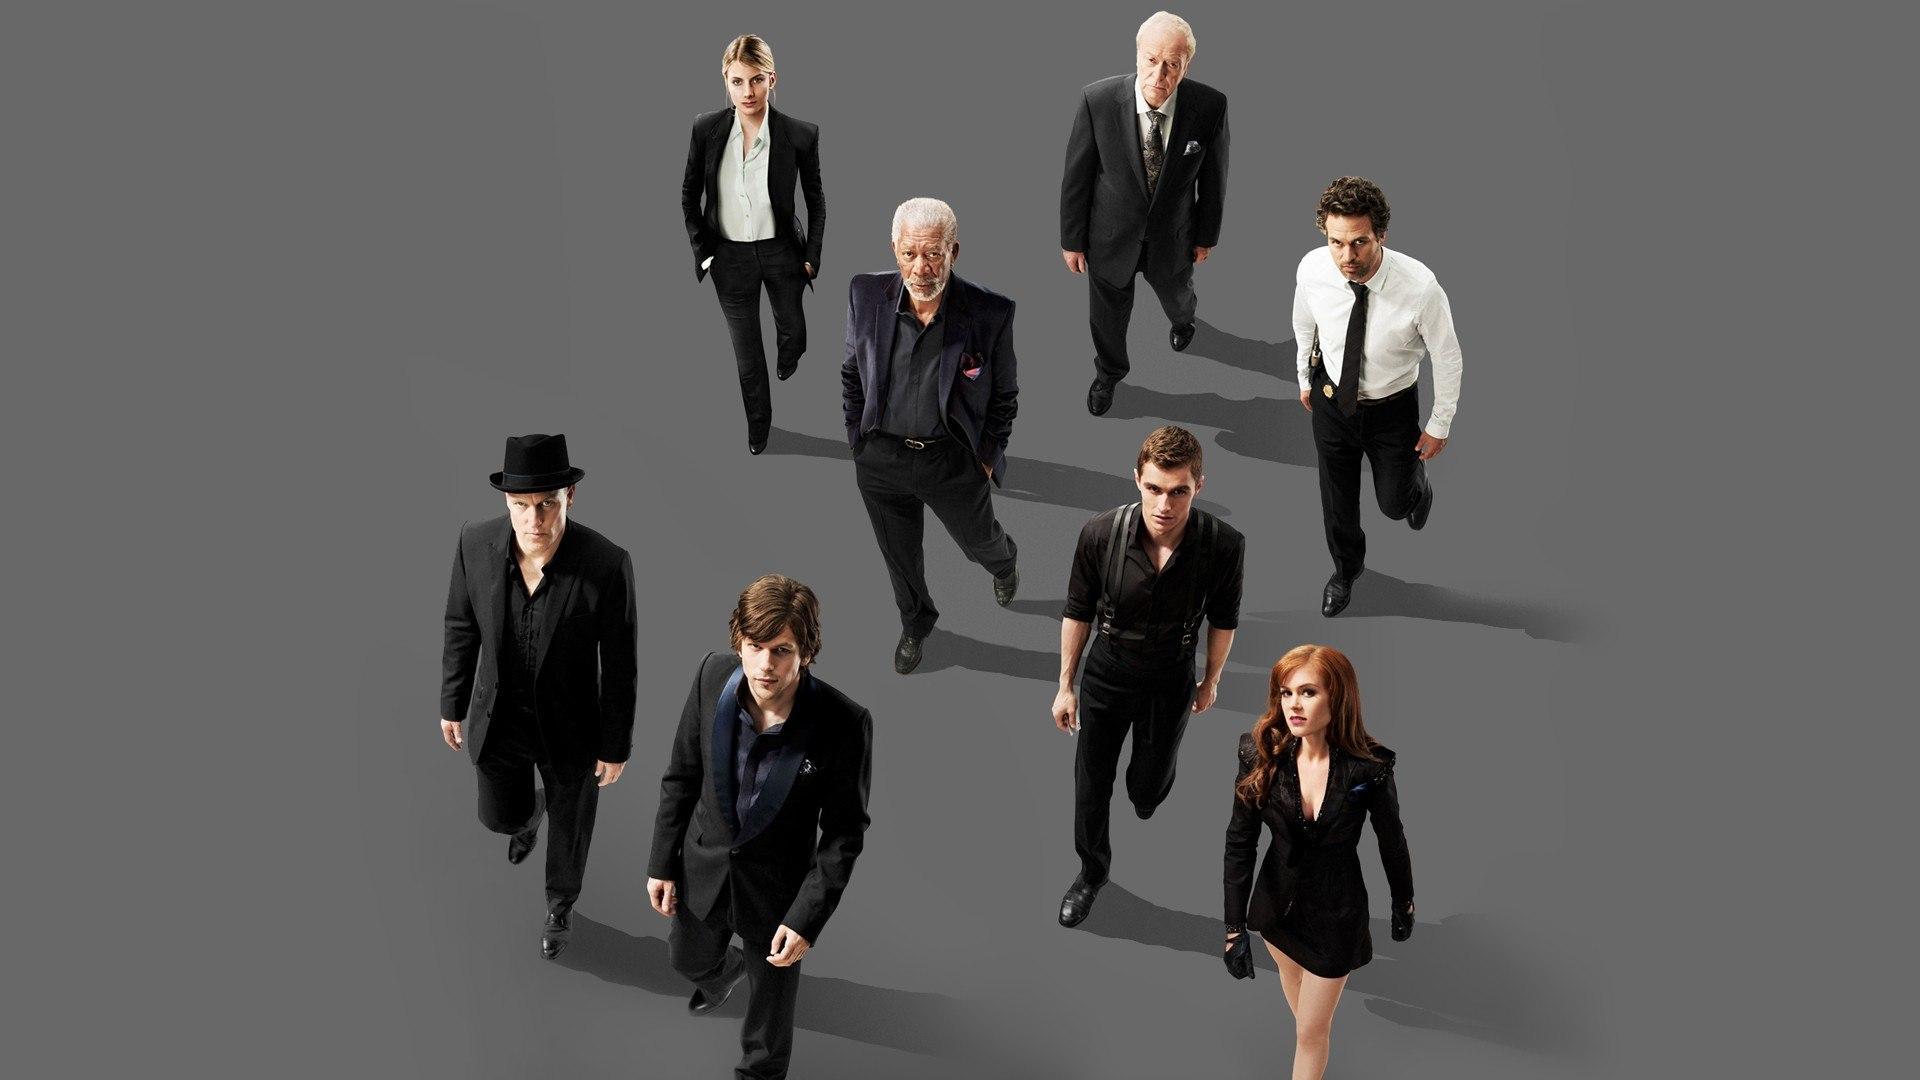 Venerdi 21 Agosto 2020 Sky Cinema HD, Now You See Me - I maghi del crimine